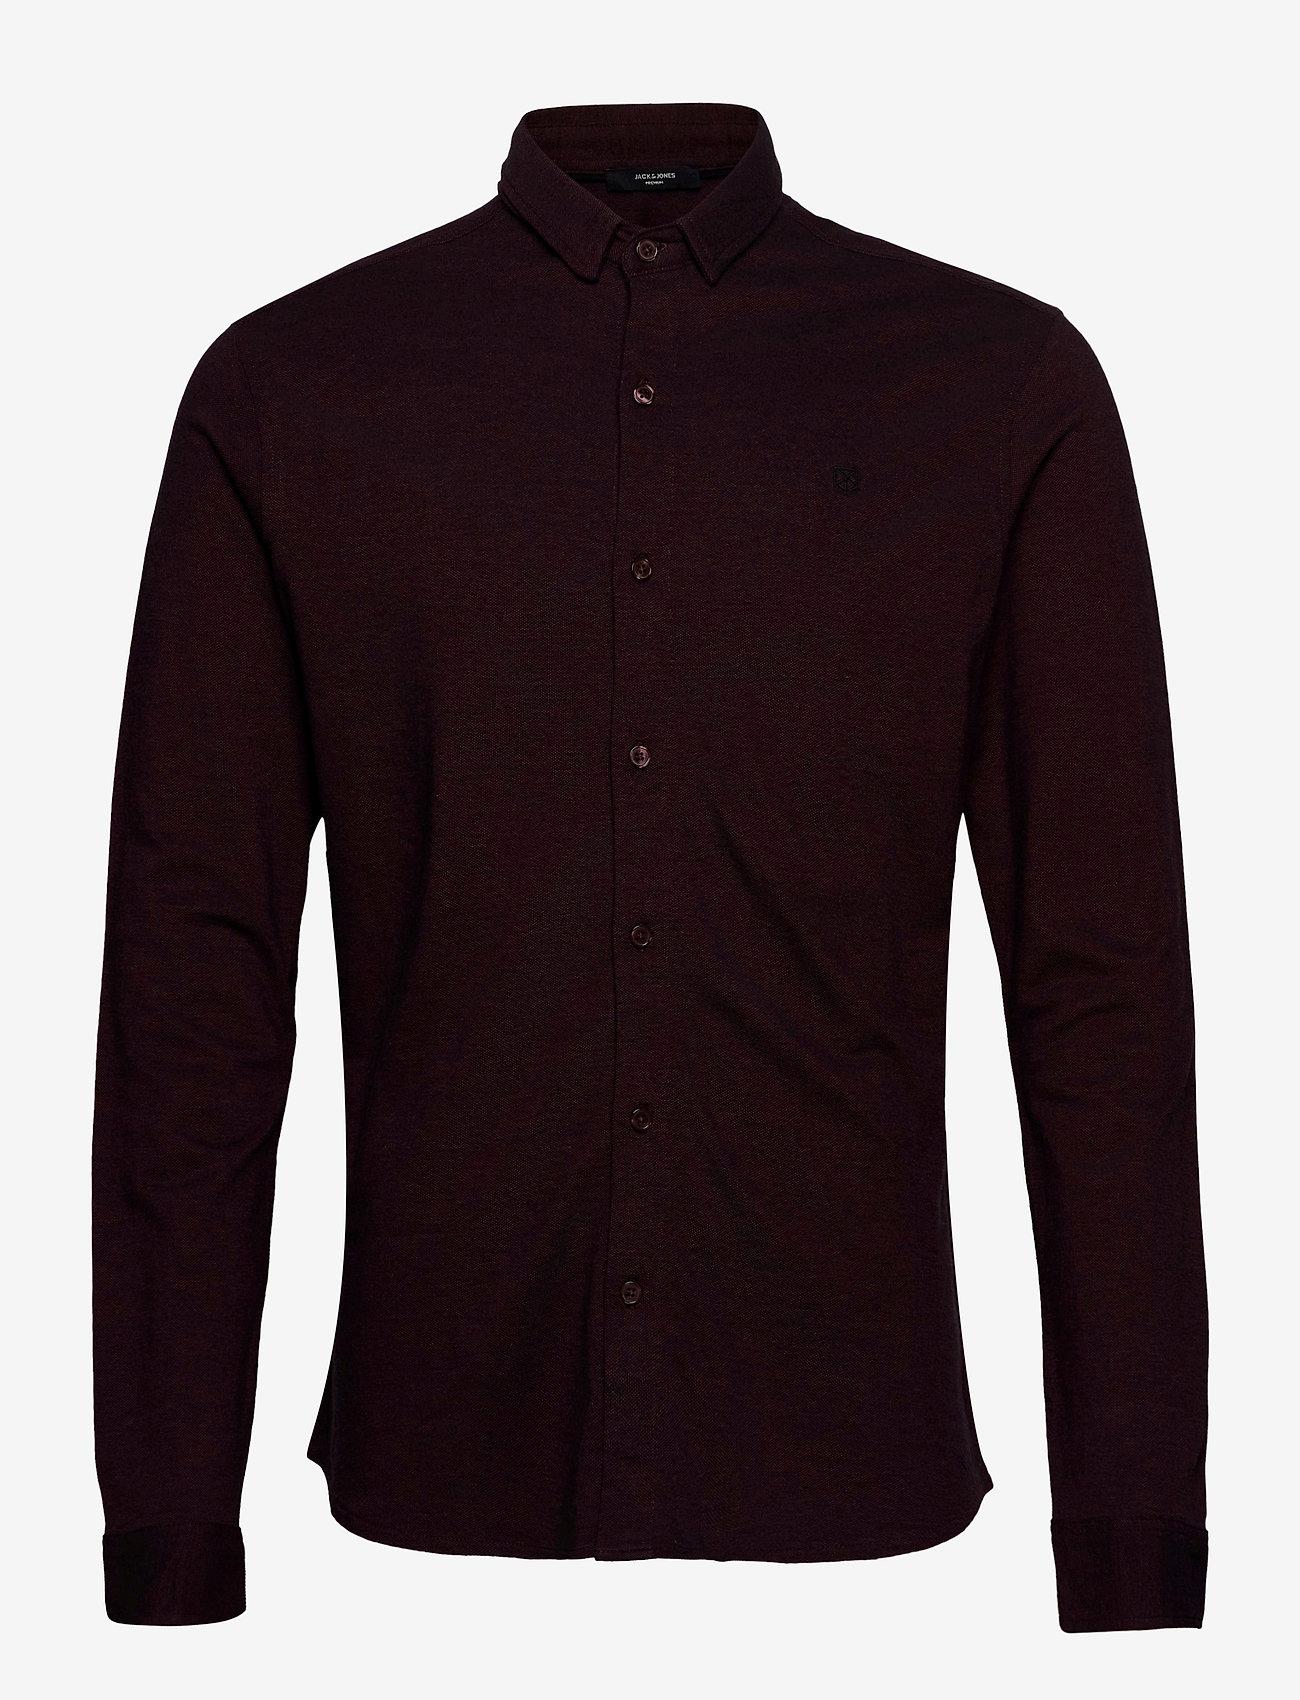 Jack & Jones - JPRBLAJACE LS JERSEY SHIRT - basic skjorter - vineyard wine - 0